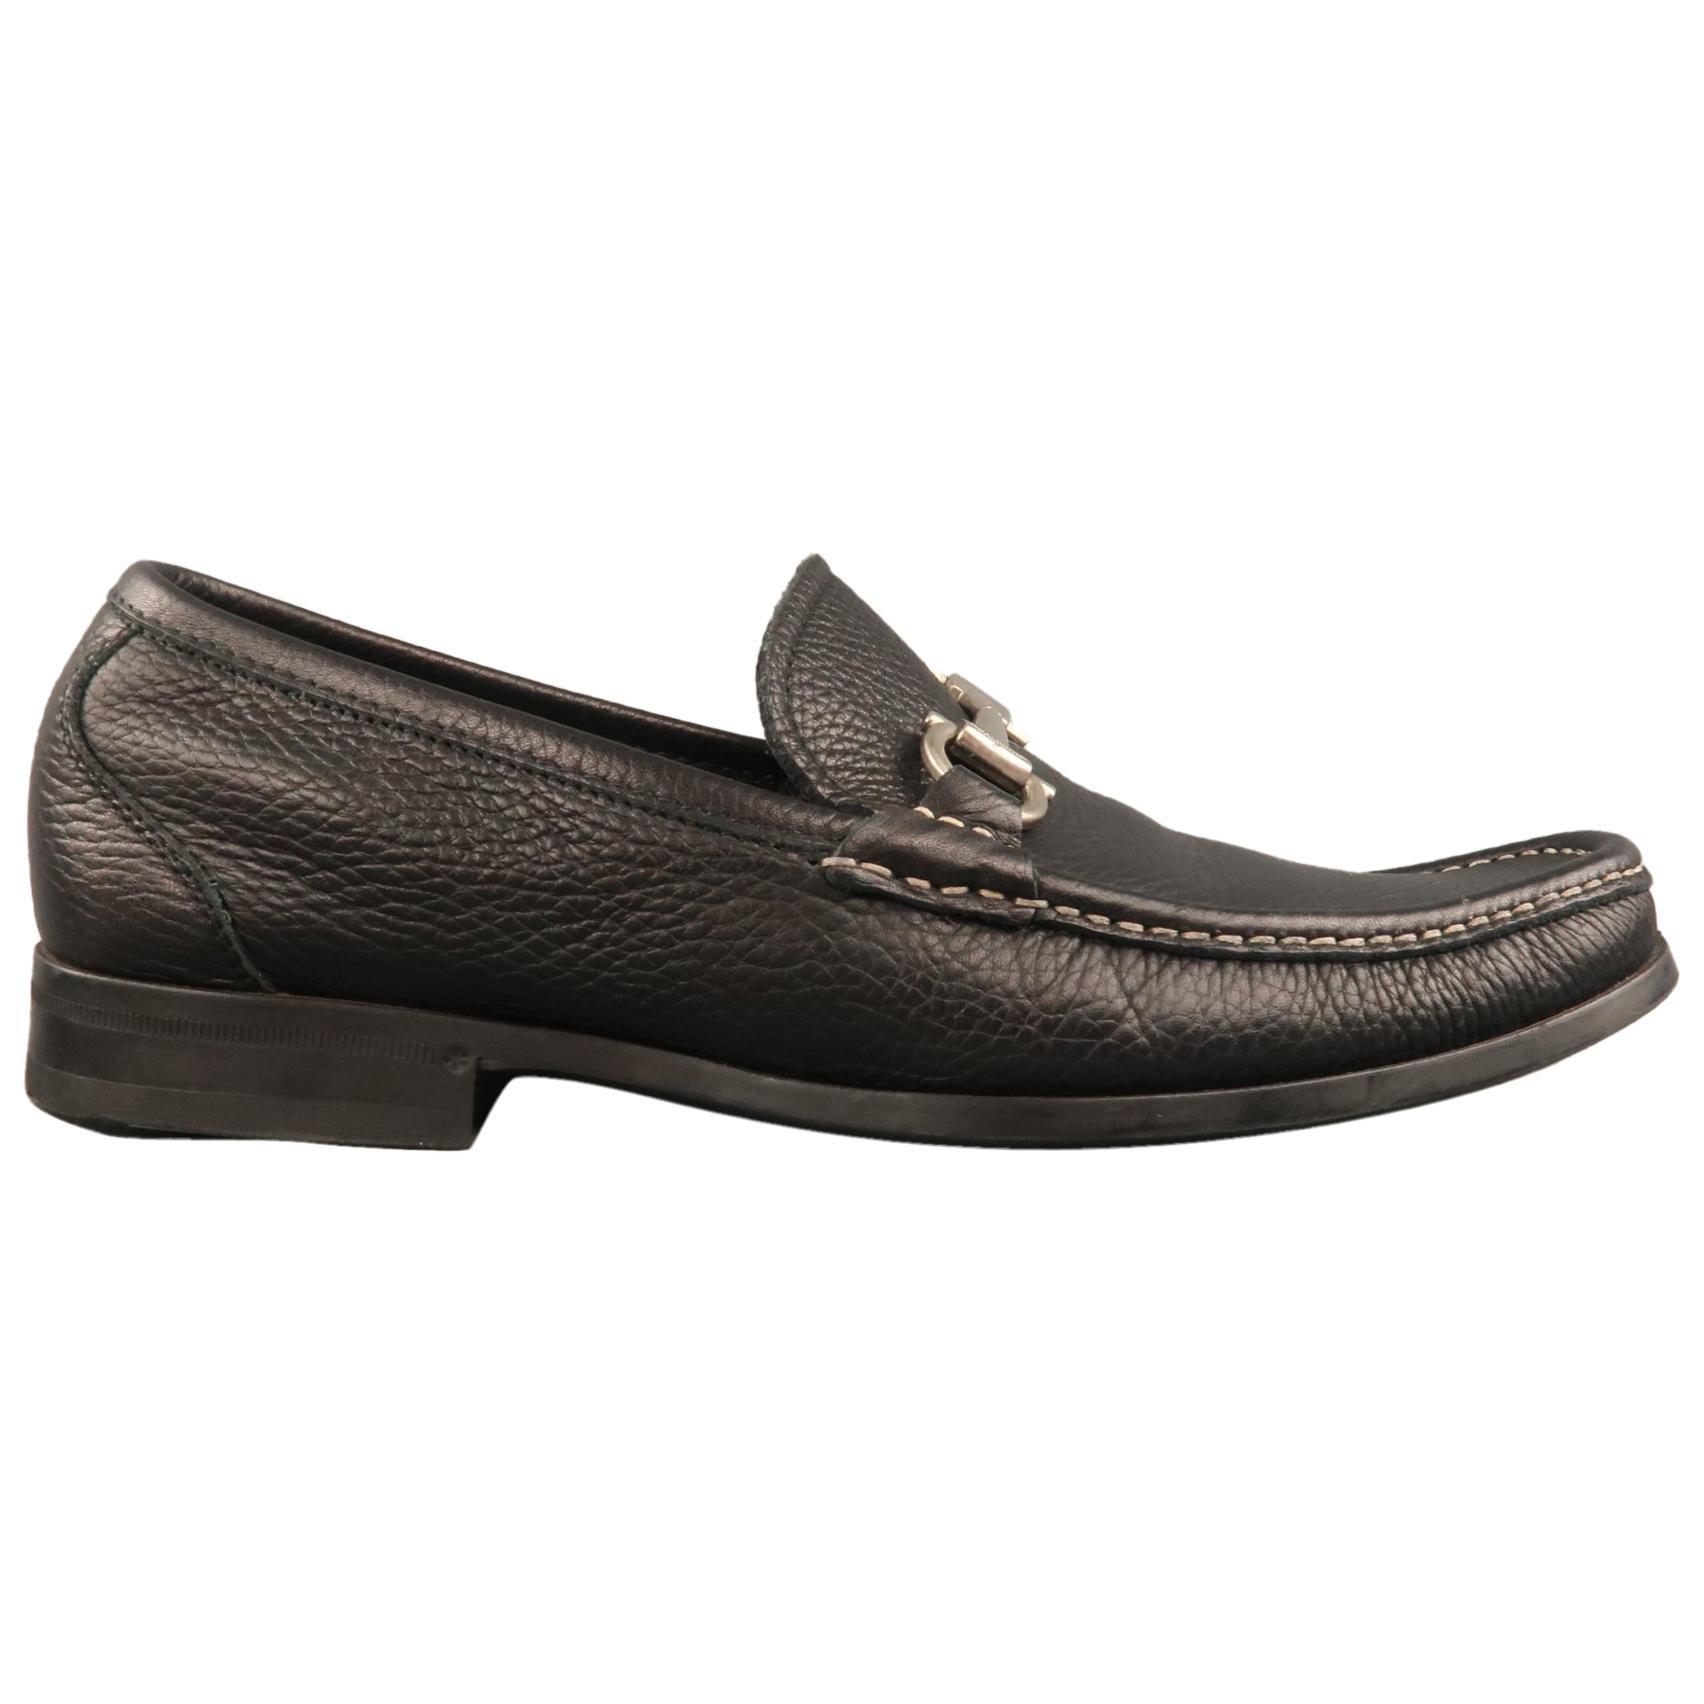 SALVATORE FERRAGAMO Size 8 Black Textured Leather Silver Gancini Loafers